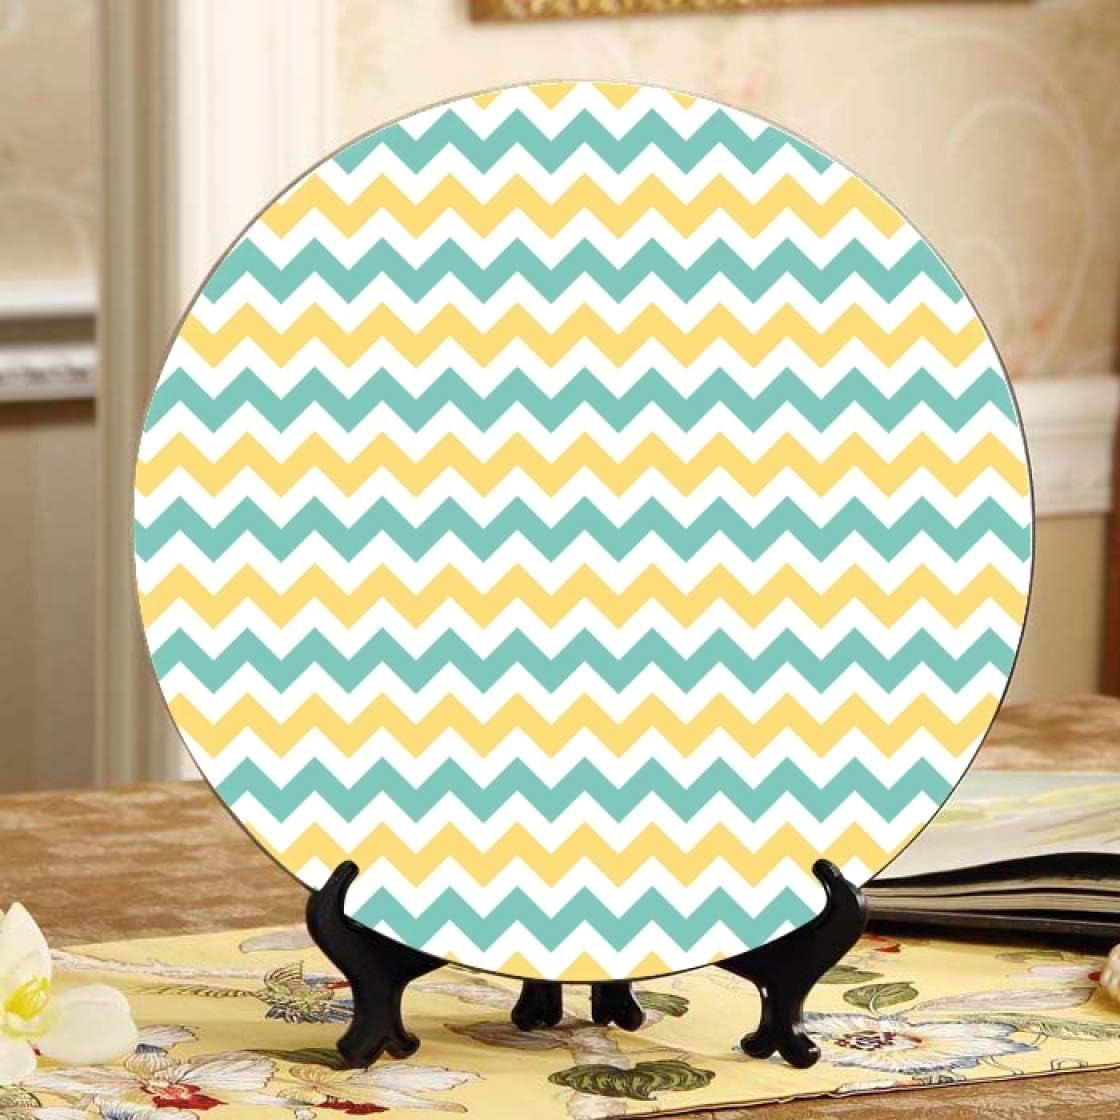 Denver Mall Lajro Zigzag Geometric Simple Summer Color Cute Super sale Decoration Plate